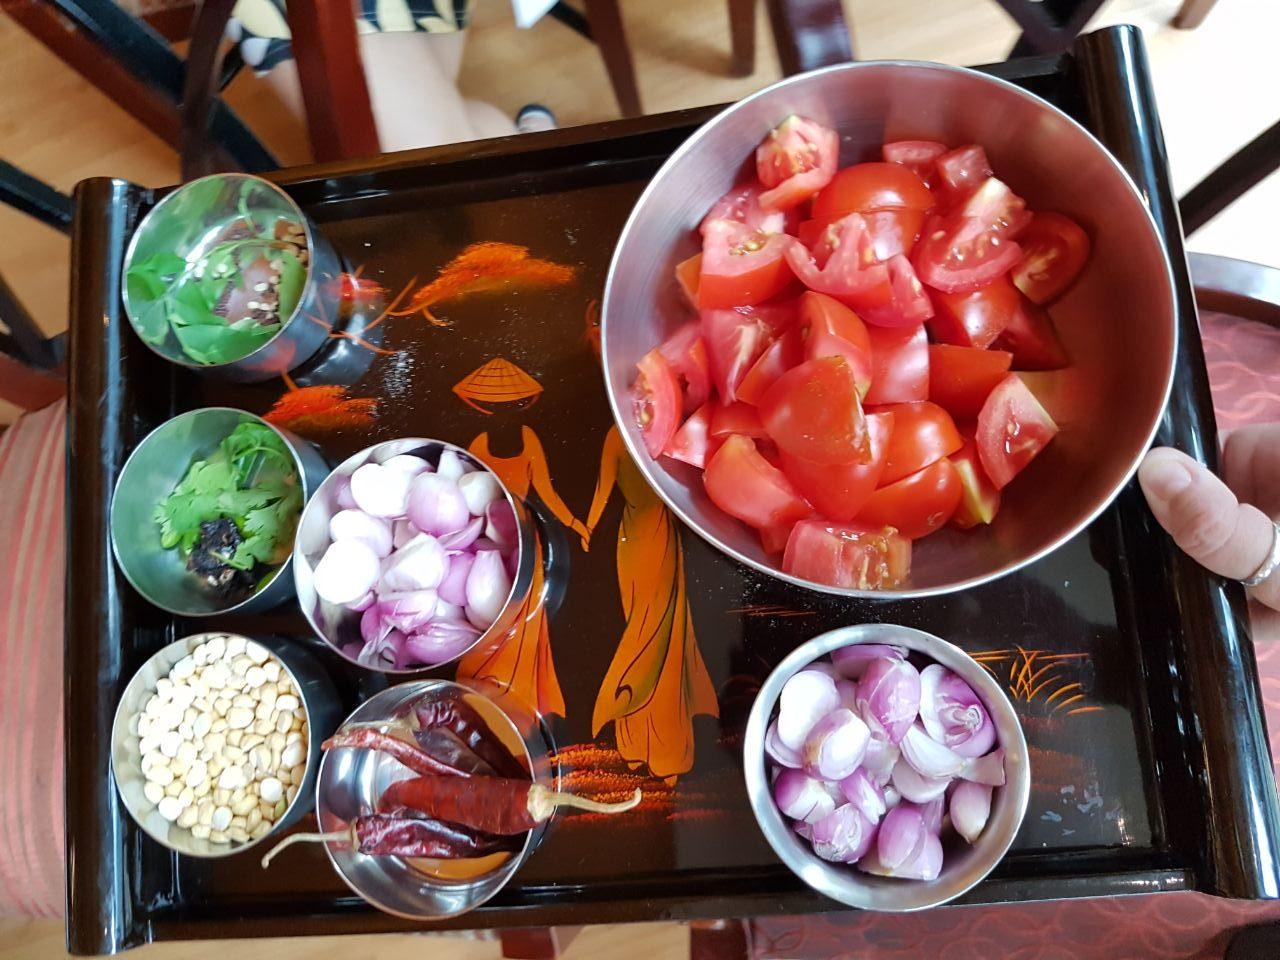 Tomato Chutney Ingredients